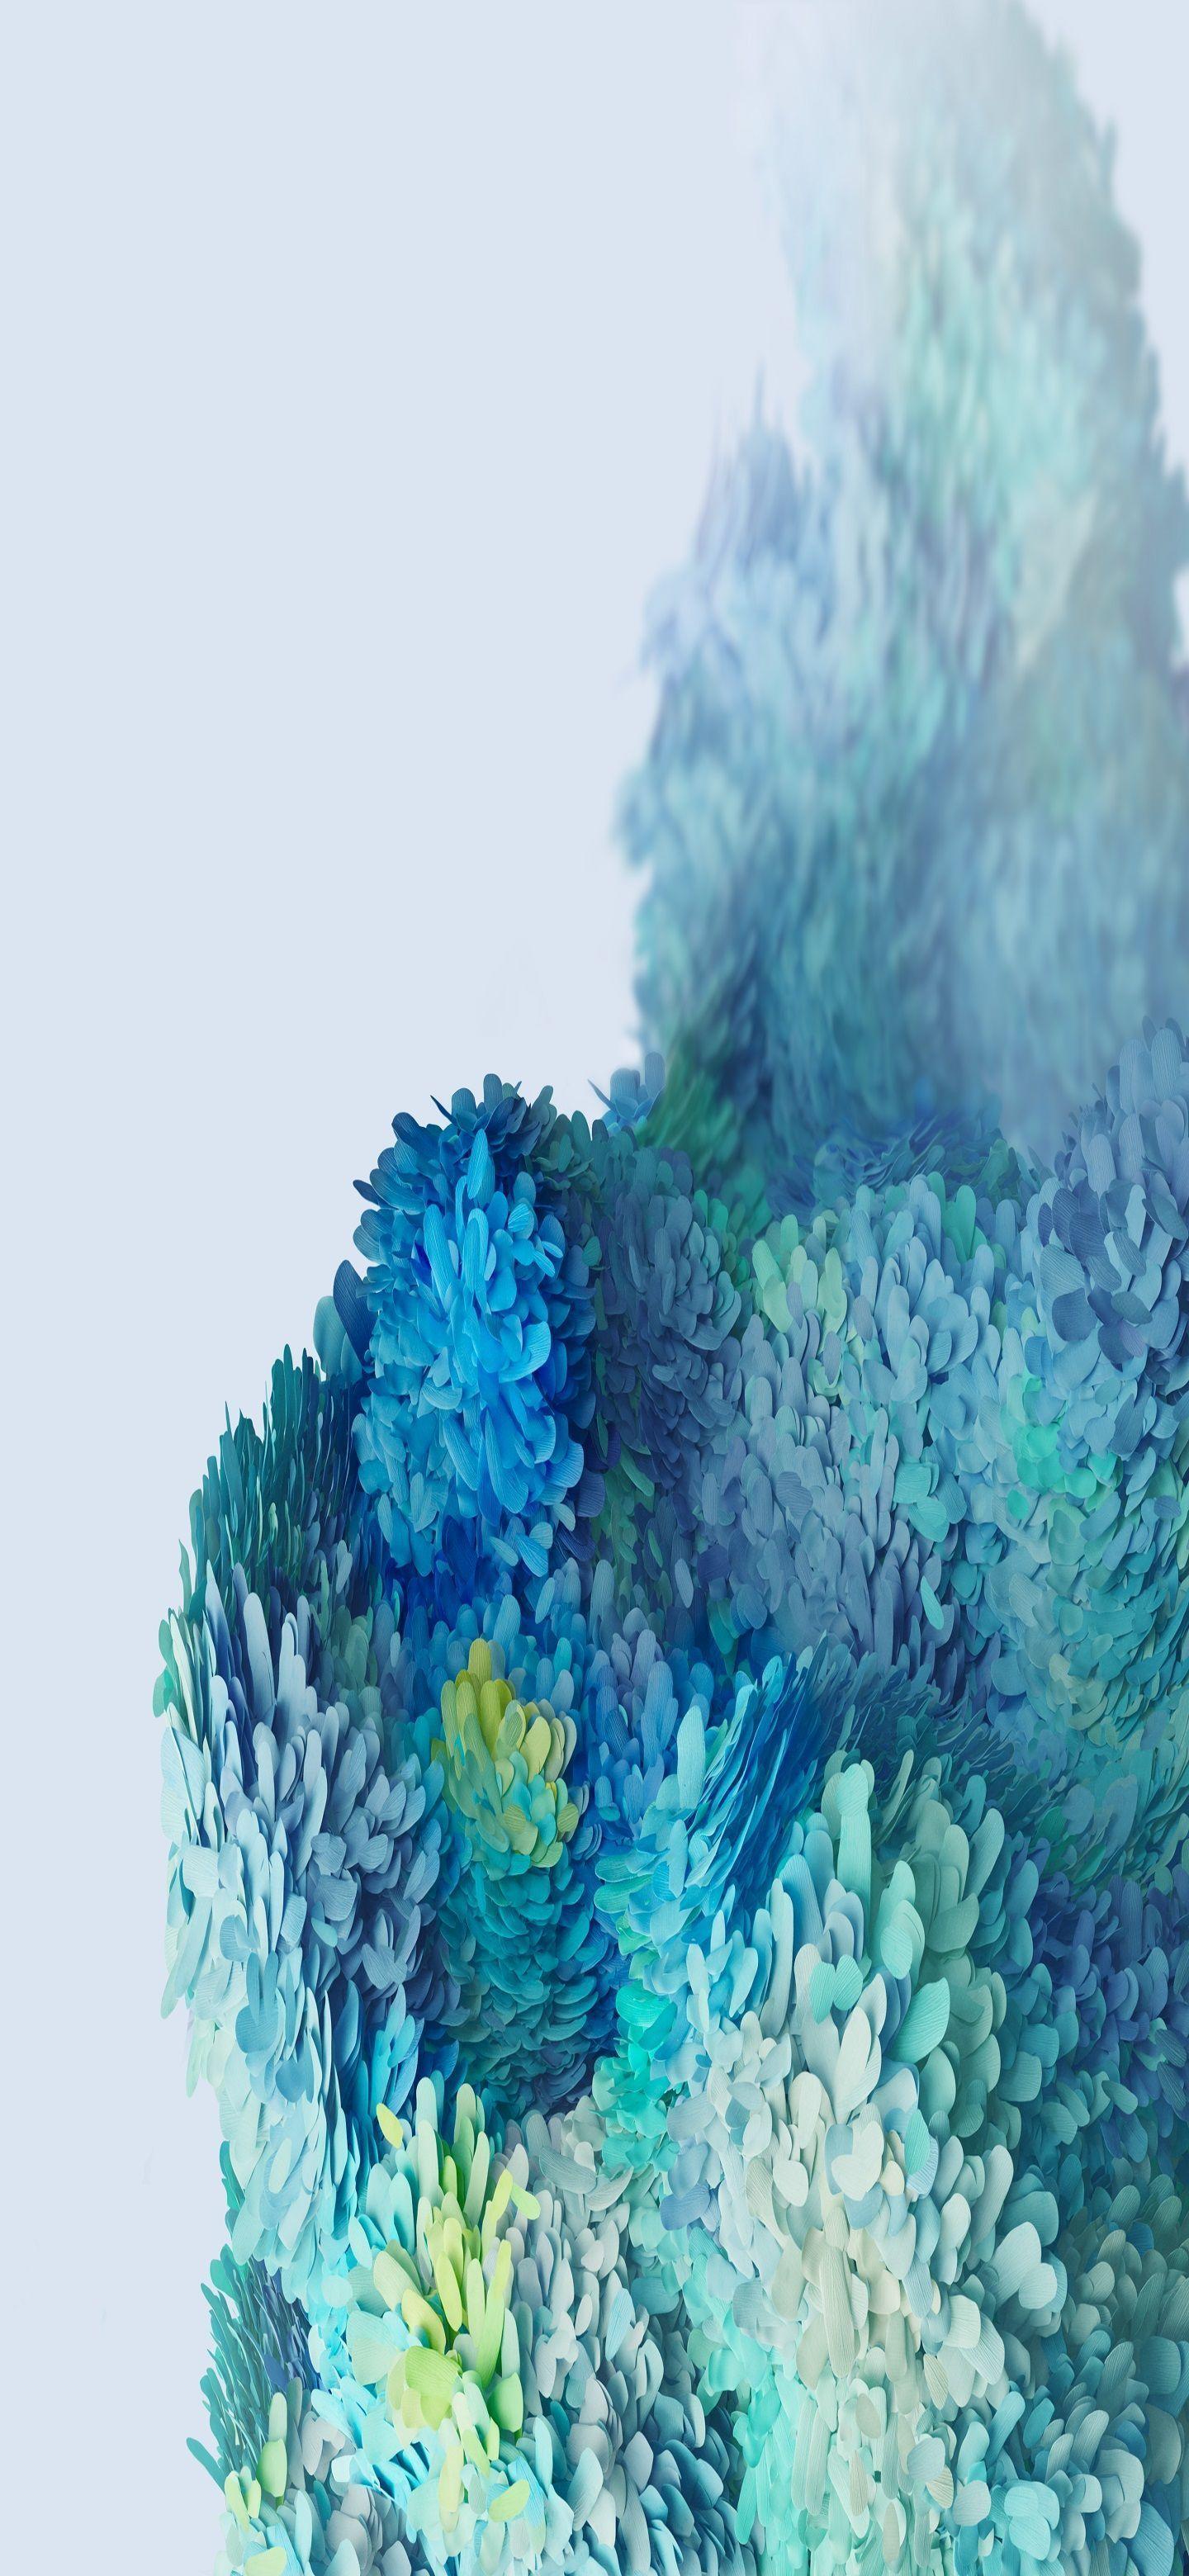 Samsung Galaxy S20 Fonds D Ecran Samsung Galaxy Wallpaper Samsung Wallpaper Stock Wallpaper